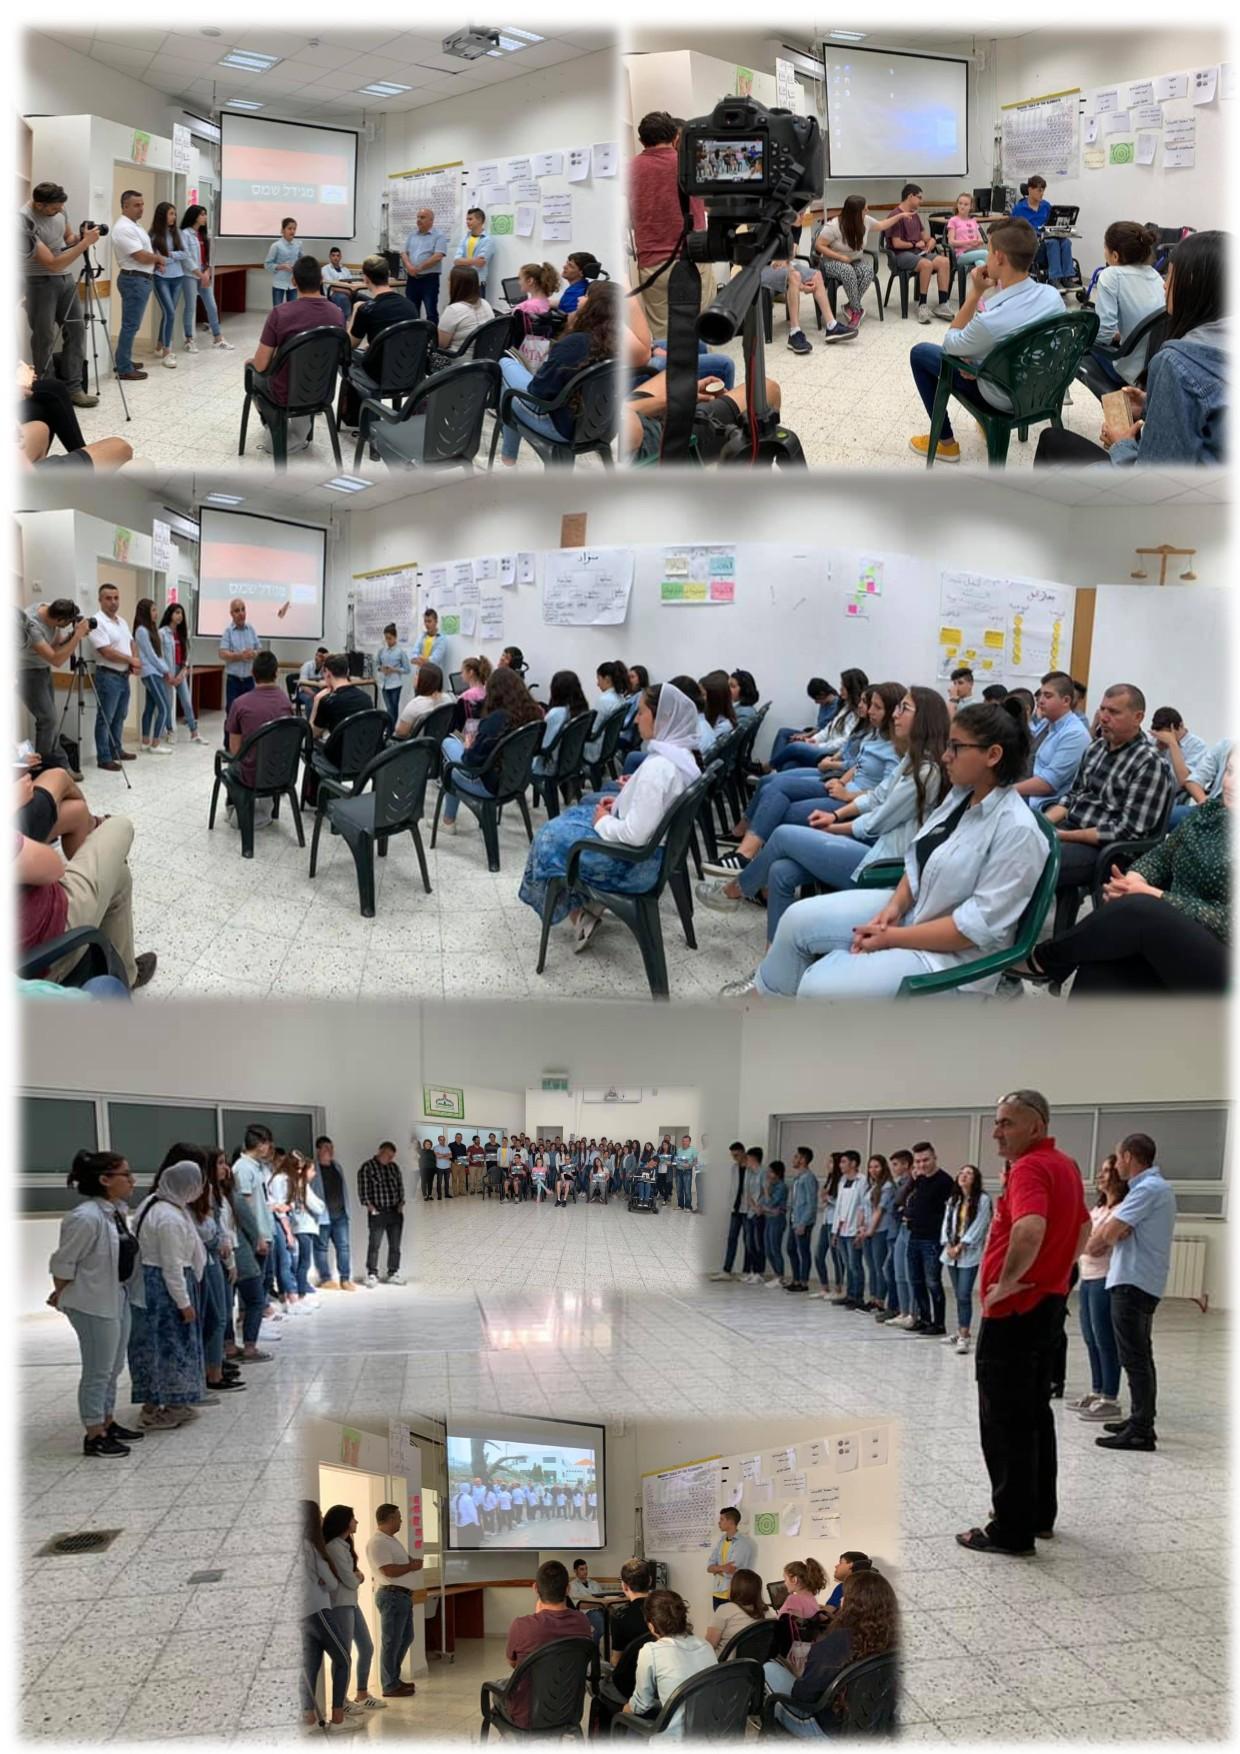 Artwork from the book - 2018-2019 الفعاليات الاجتماعية الصفية إعدادية مجدل شمس by Ameen Qadhamany - Ourboox.com